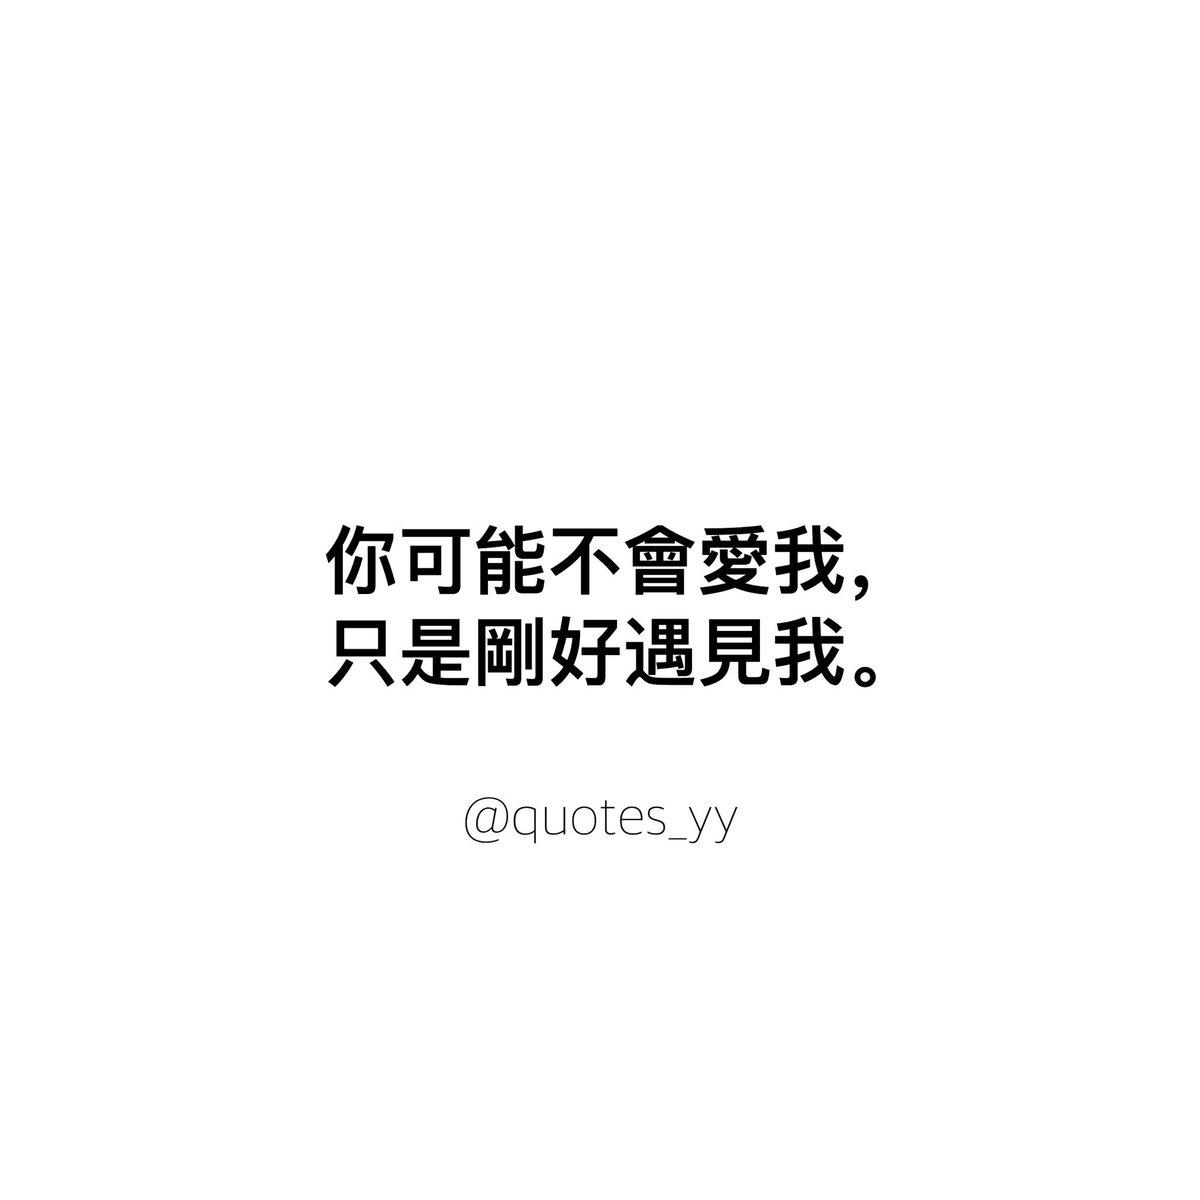 #quotes_yy #quotes #語錄